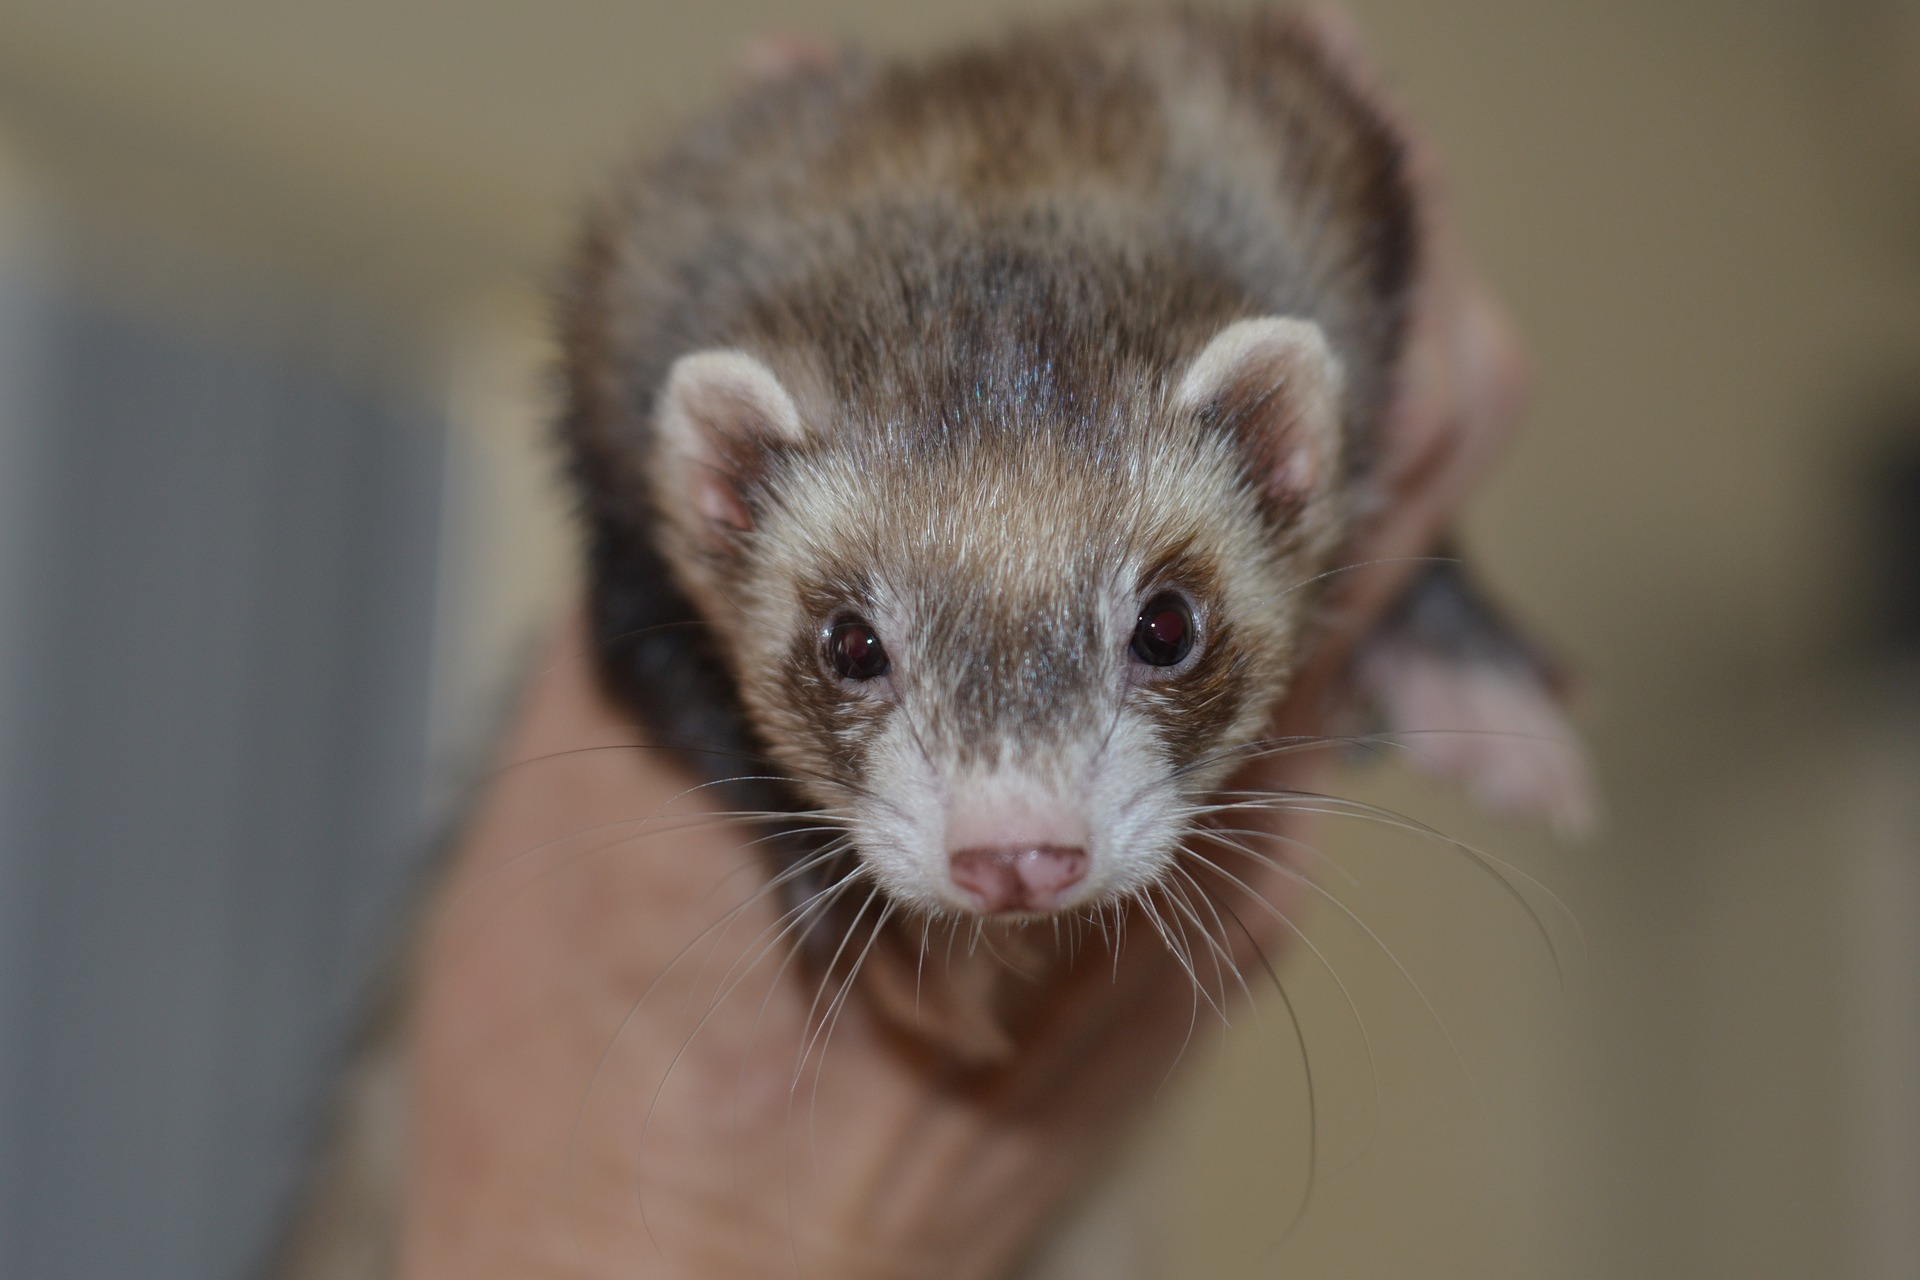 A photo of a ferret.